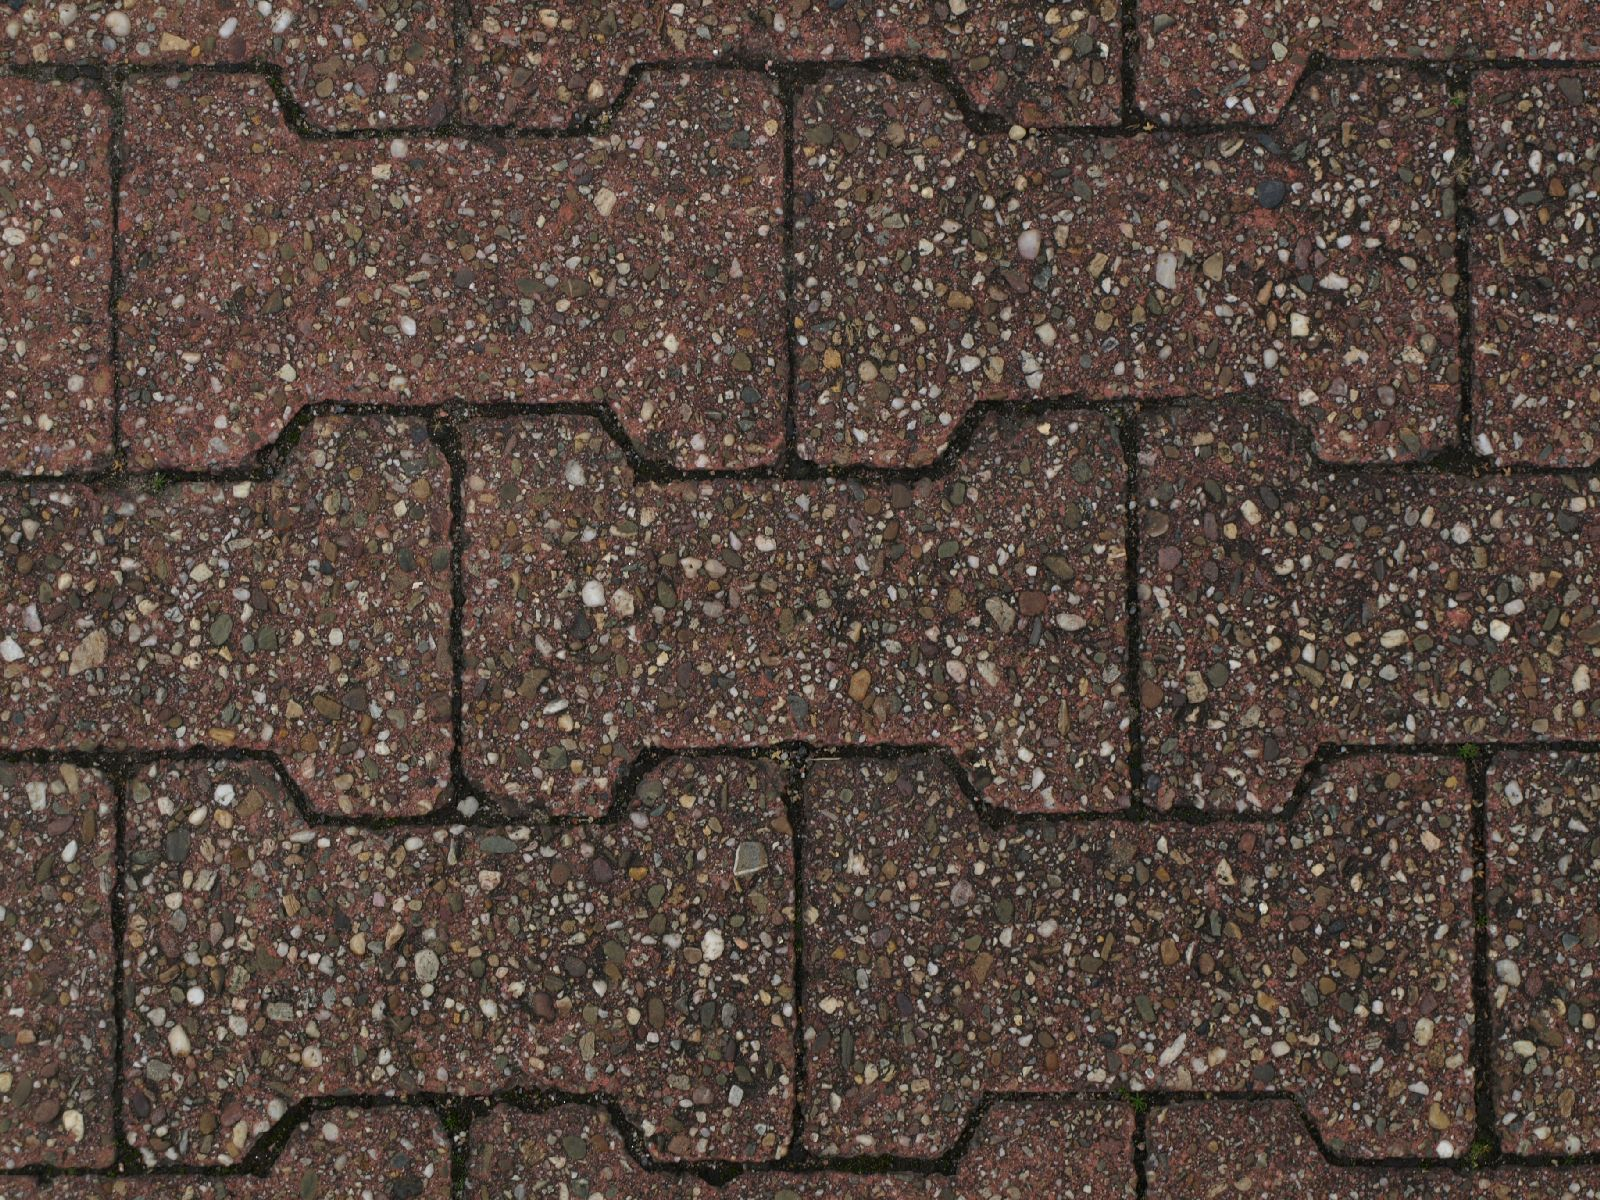 Ground-Urban_Texture_A_PA045716